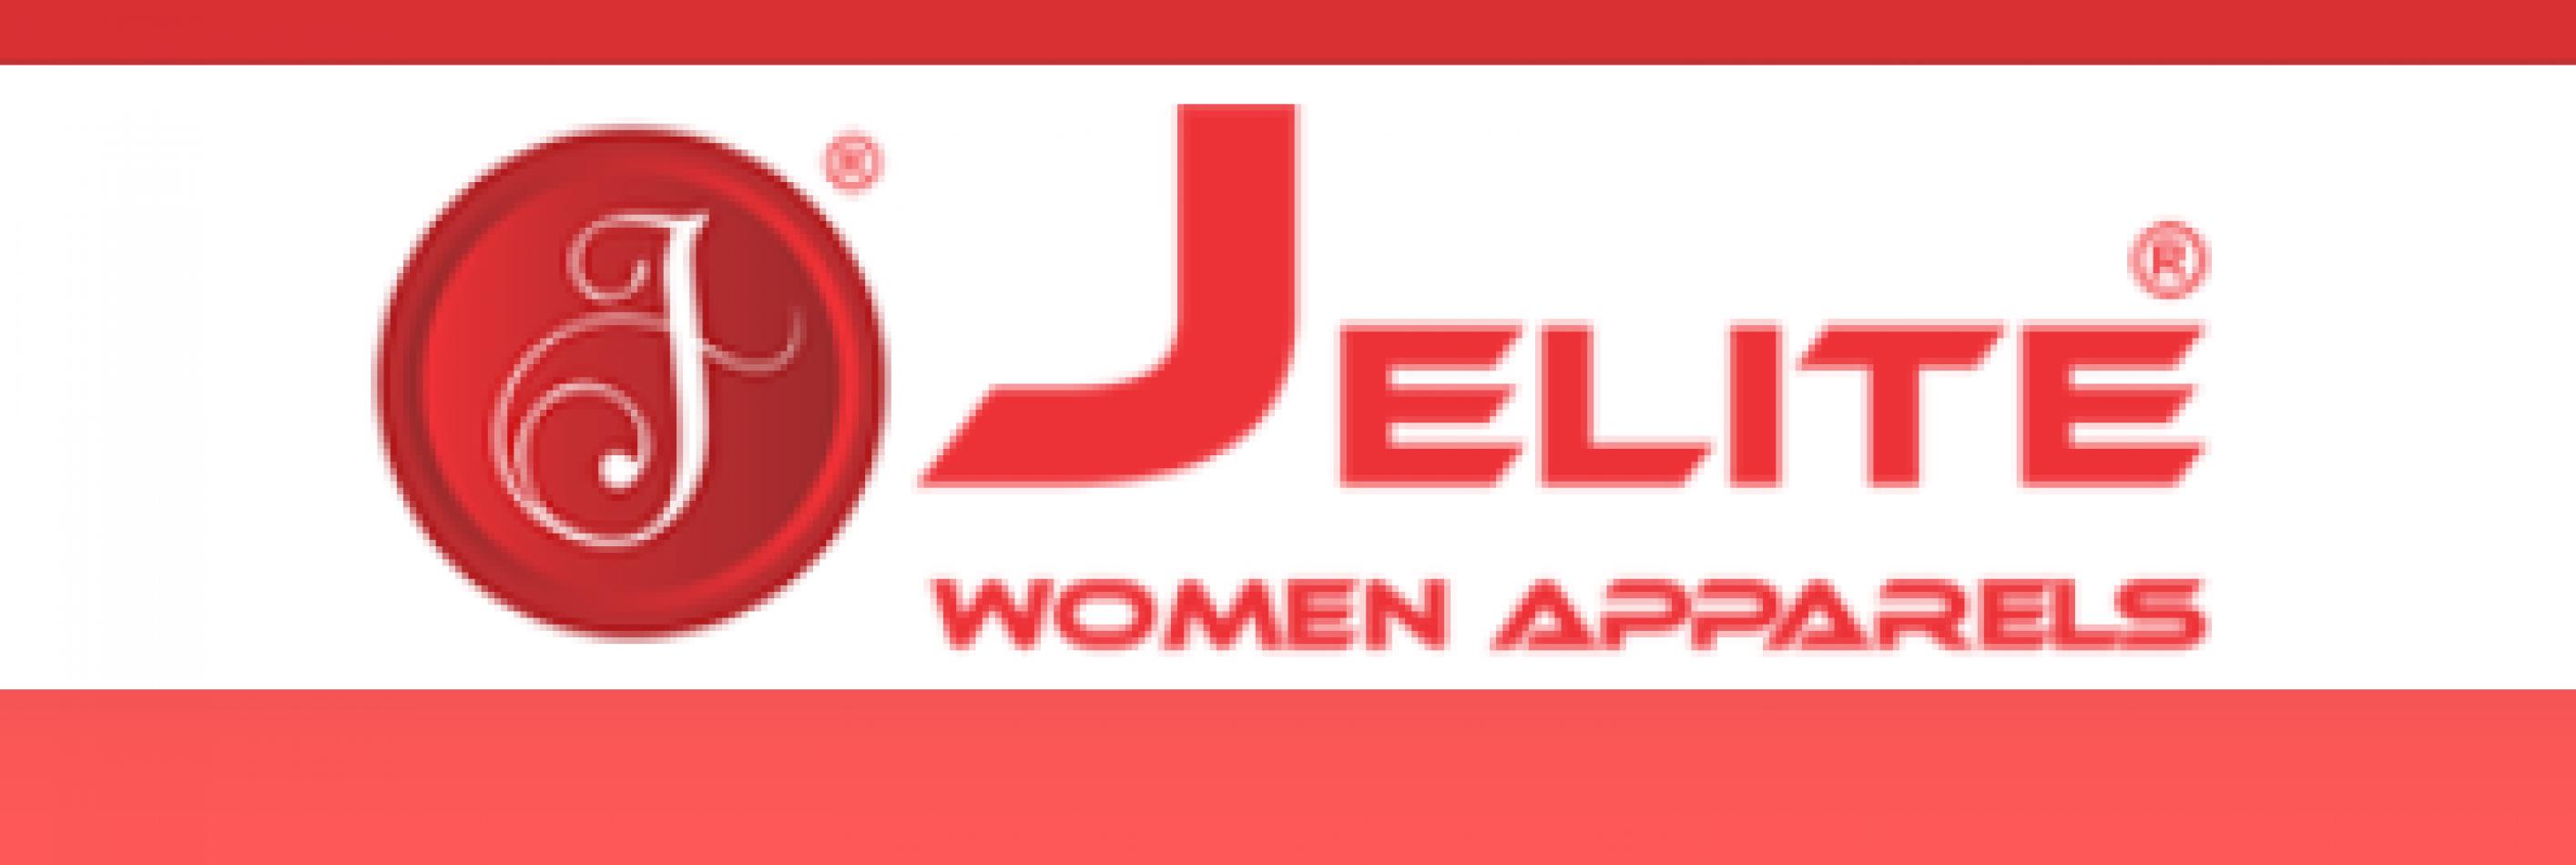 Jelite Women Apparels